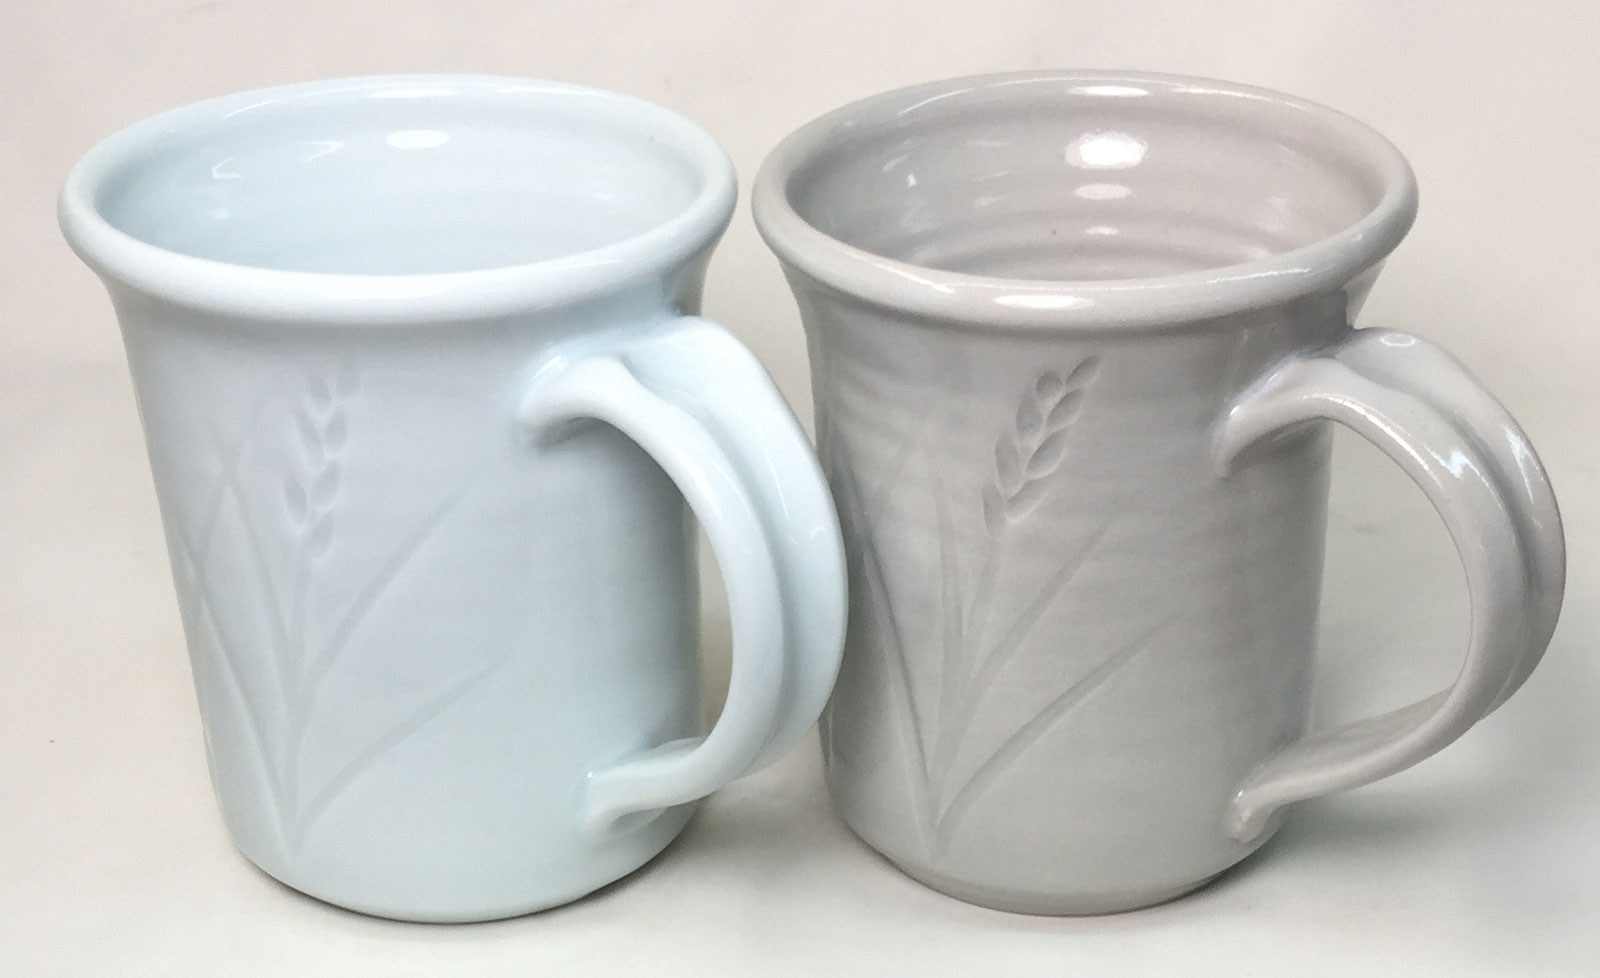 A Grolleg based cone 10R porcelain (left) vs. 25-Porcelain